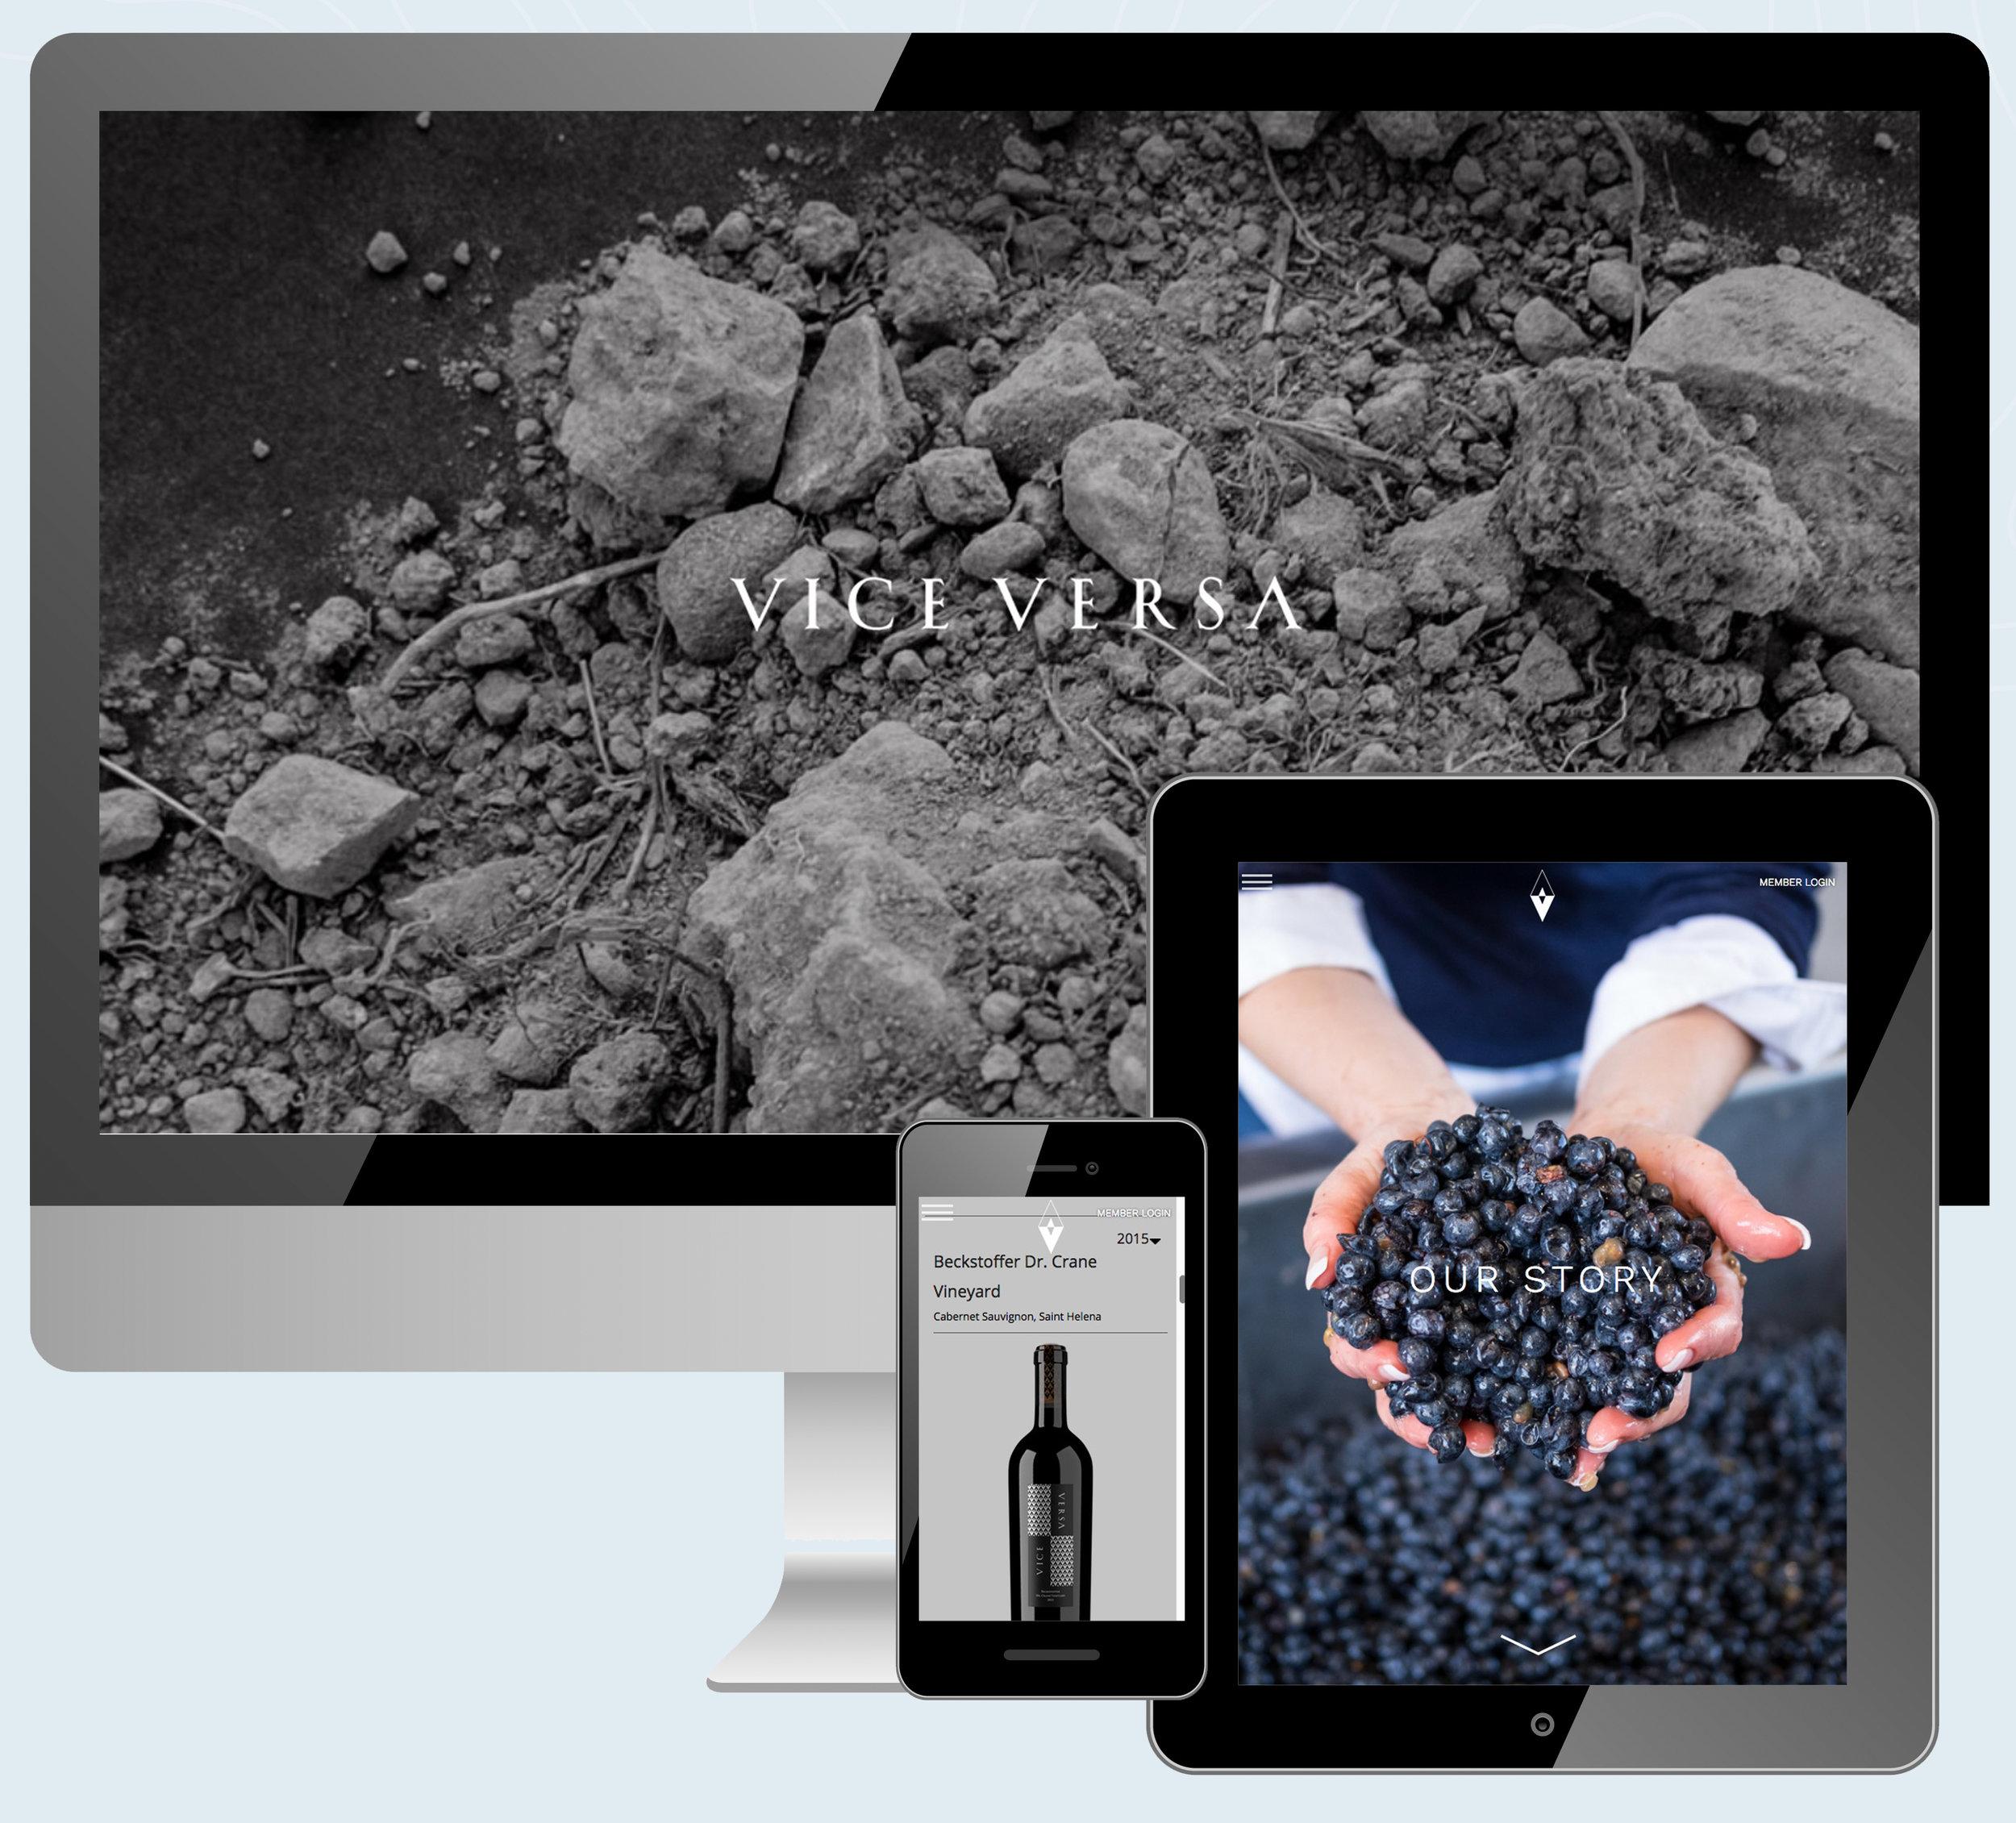 Vice Versa Wines